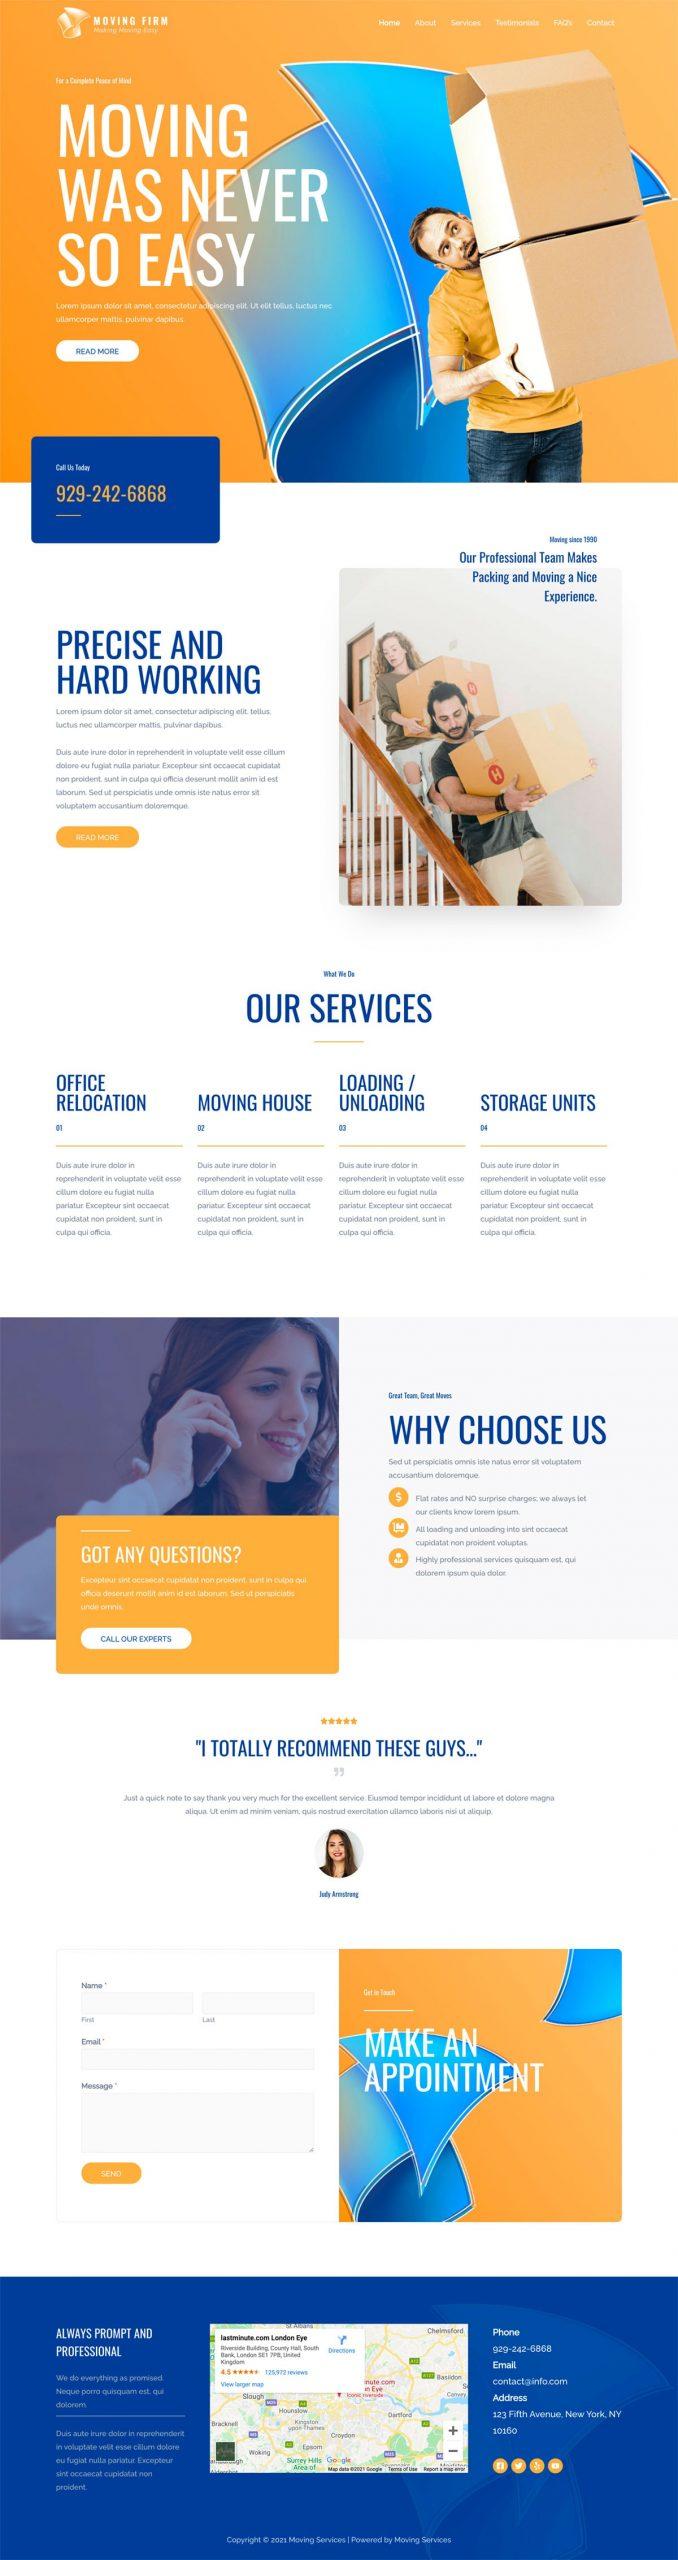 Adamo Web Design | Web Design Durham | moving services 04 home scaled